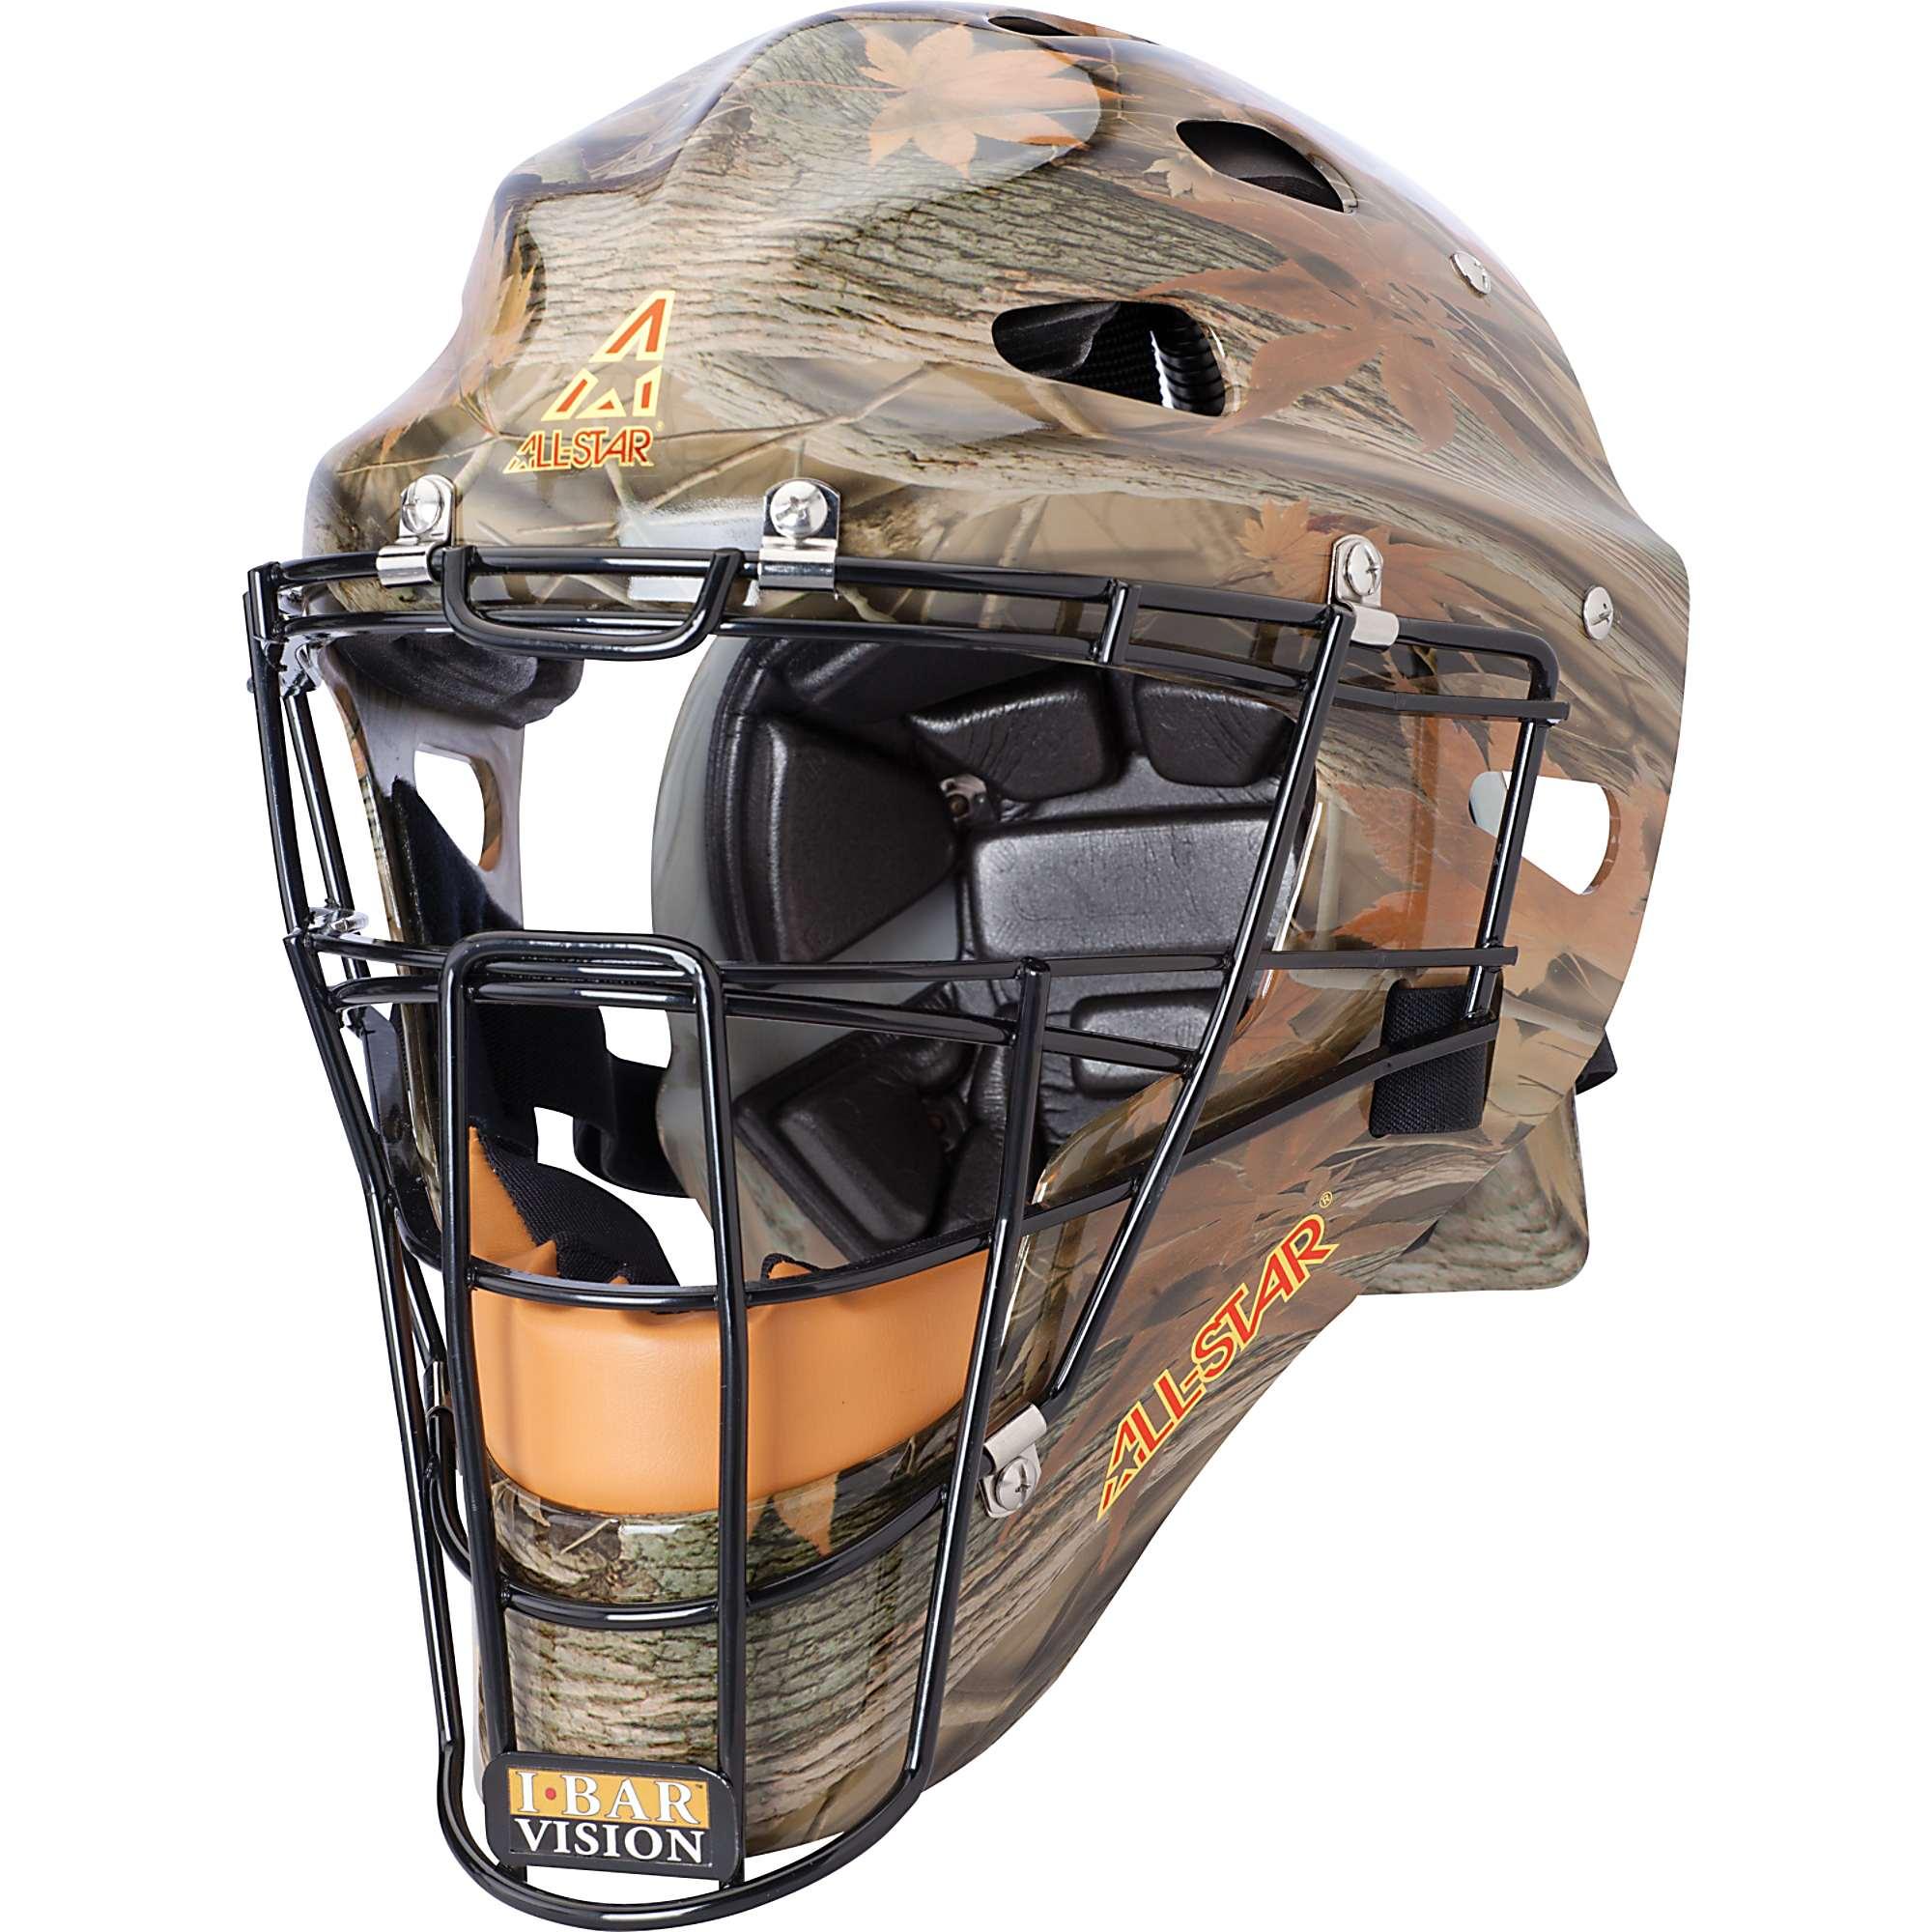 All-Star Youth Camo Mvp Catcher's Helmet